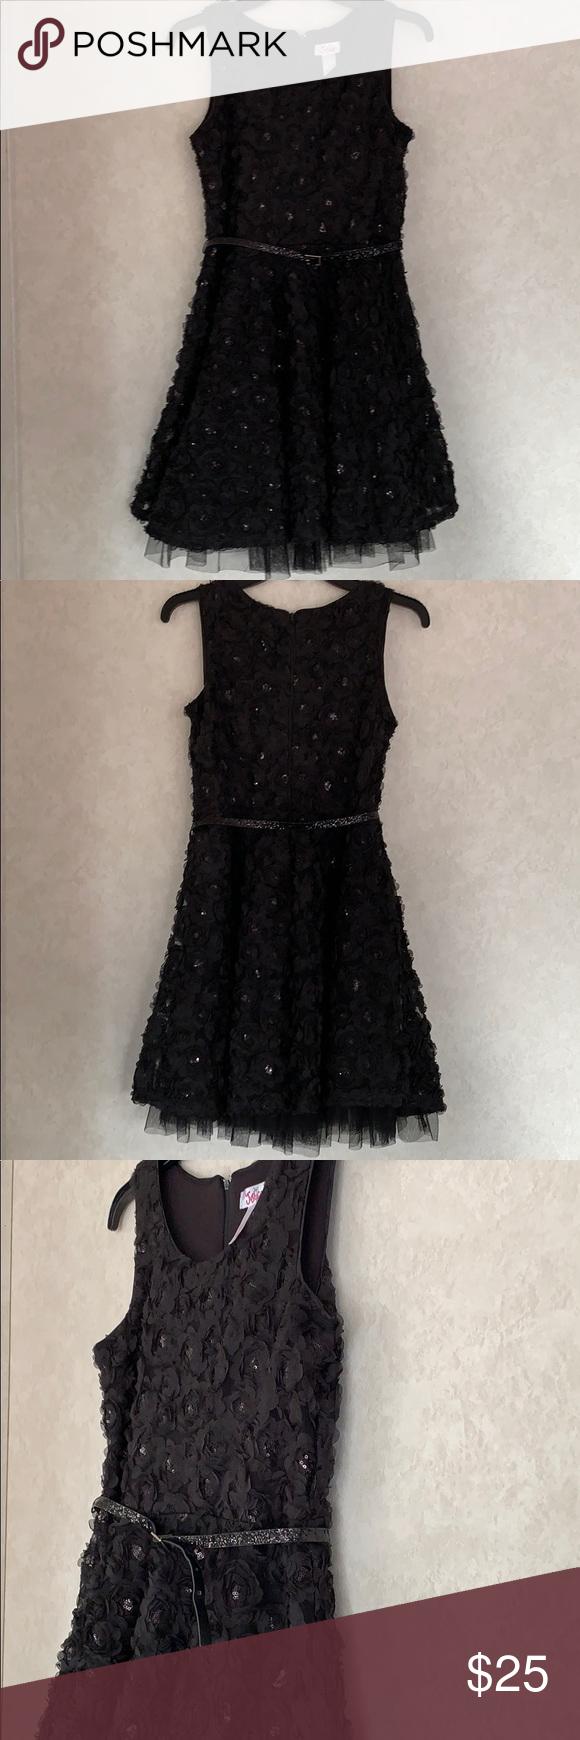 Justice Girls Black Dress Size 16 Girls Black Dress Beautiful Black Dresses Size 16 Dresses [ 1740 x 580 Pixel ]